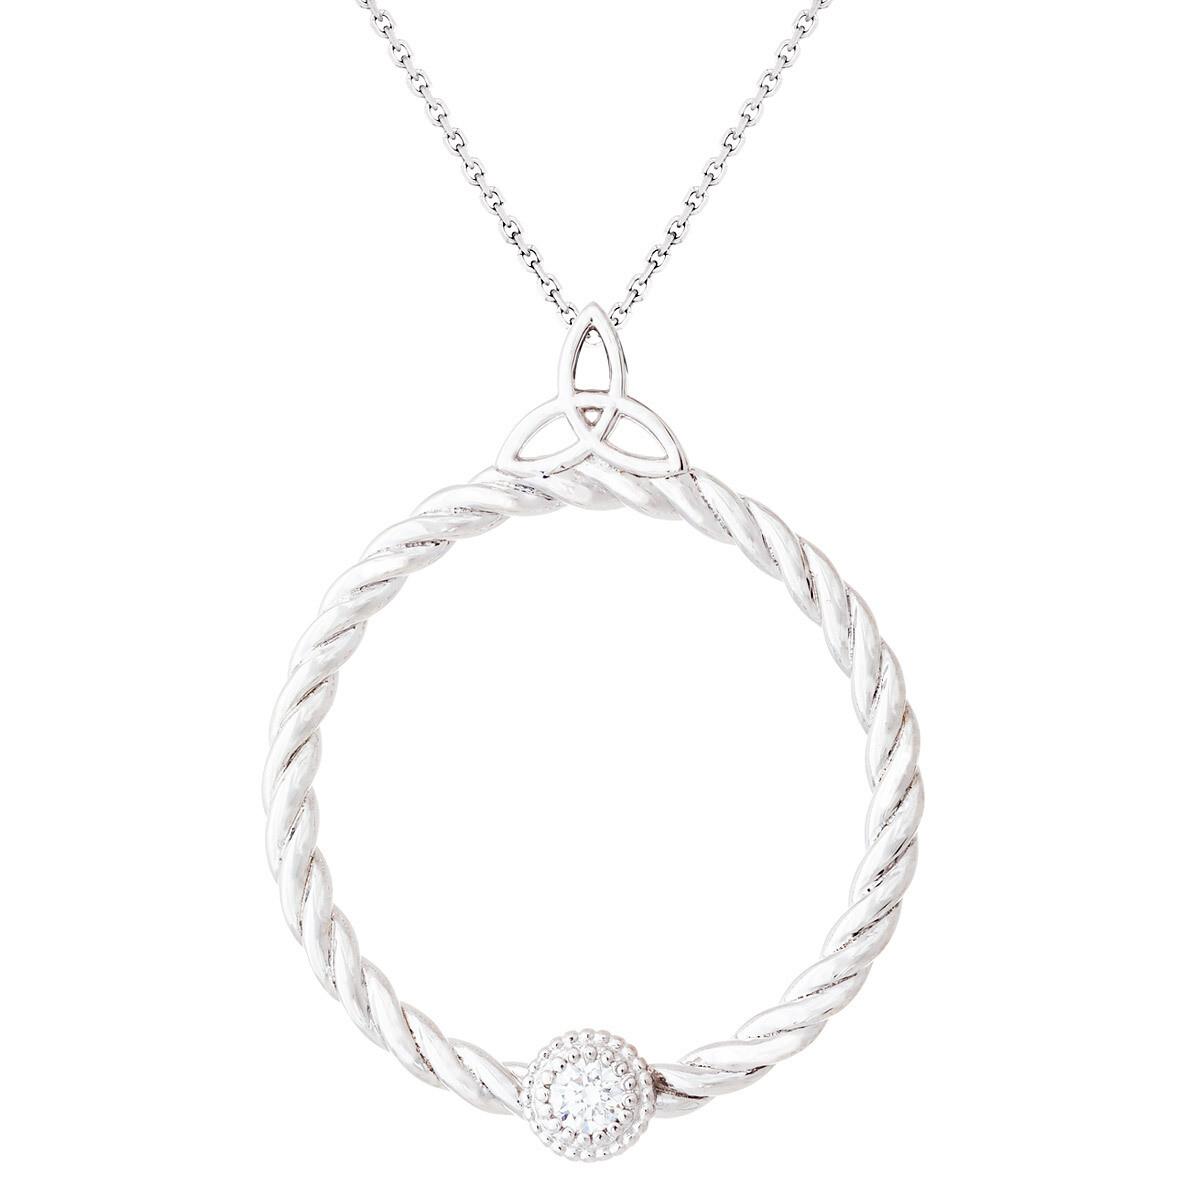 CC Celtic Braid©—Silver w/ Diamond